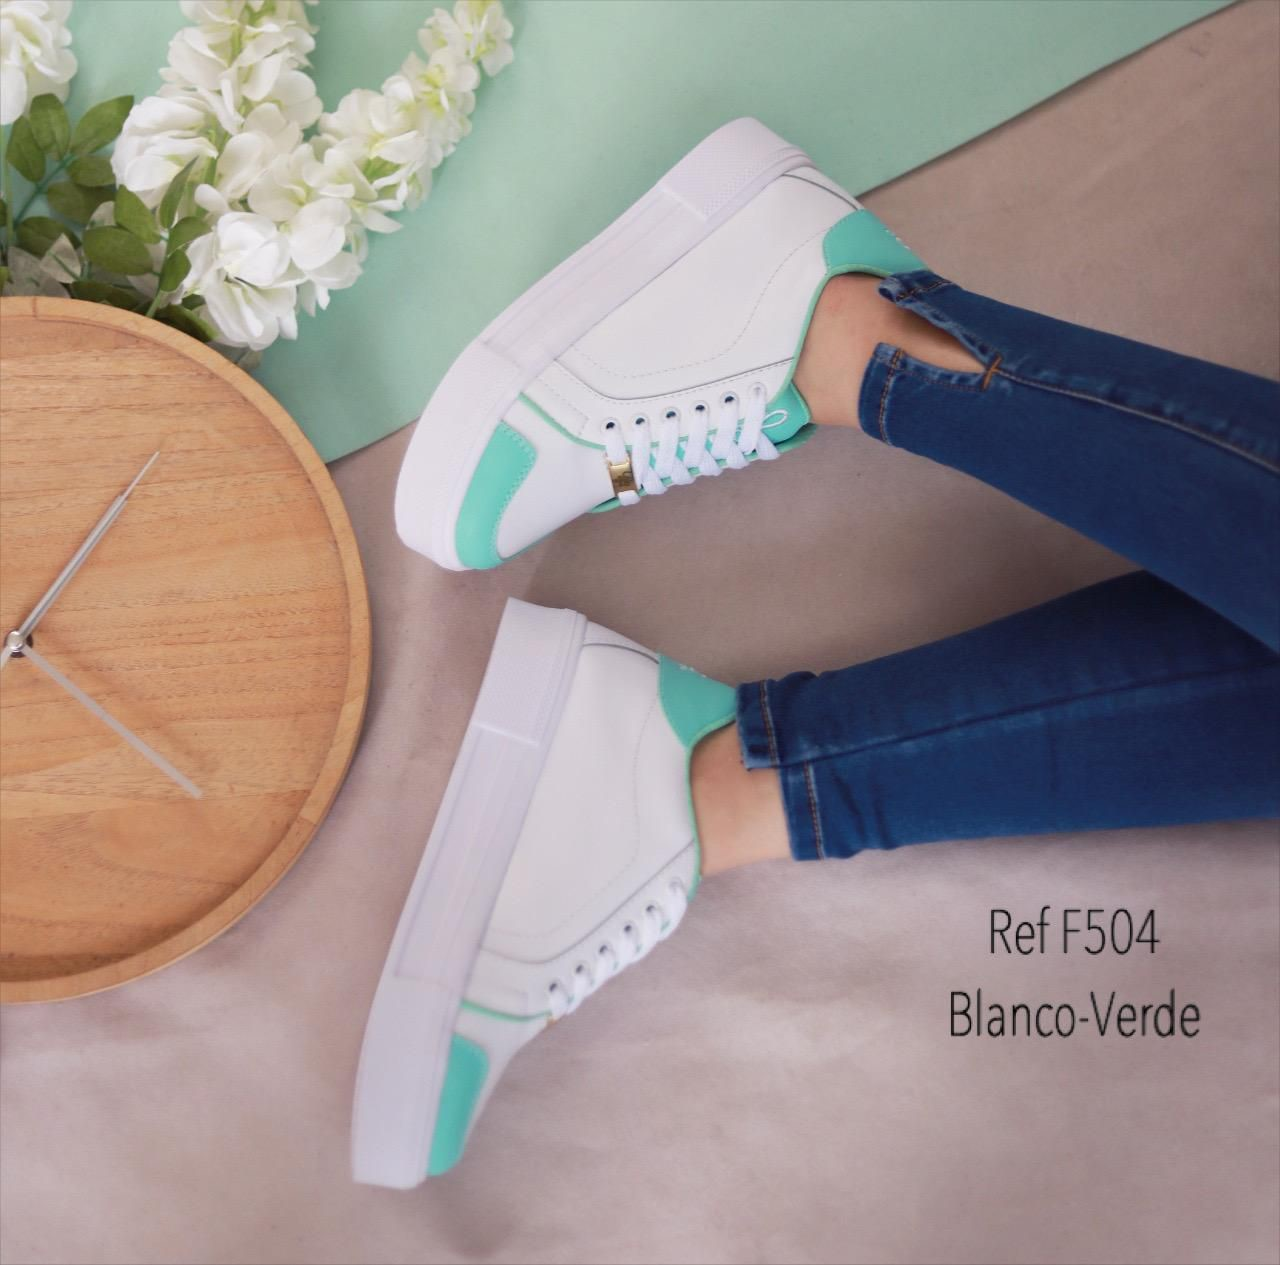 RefF-504 Blanco/verde